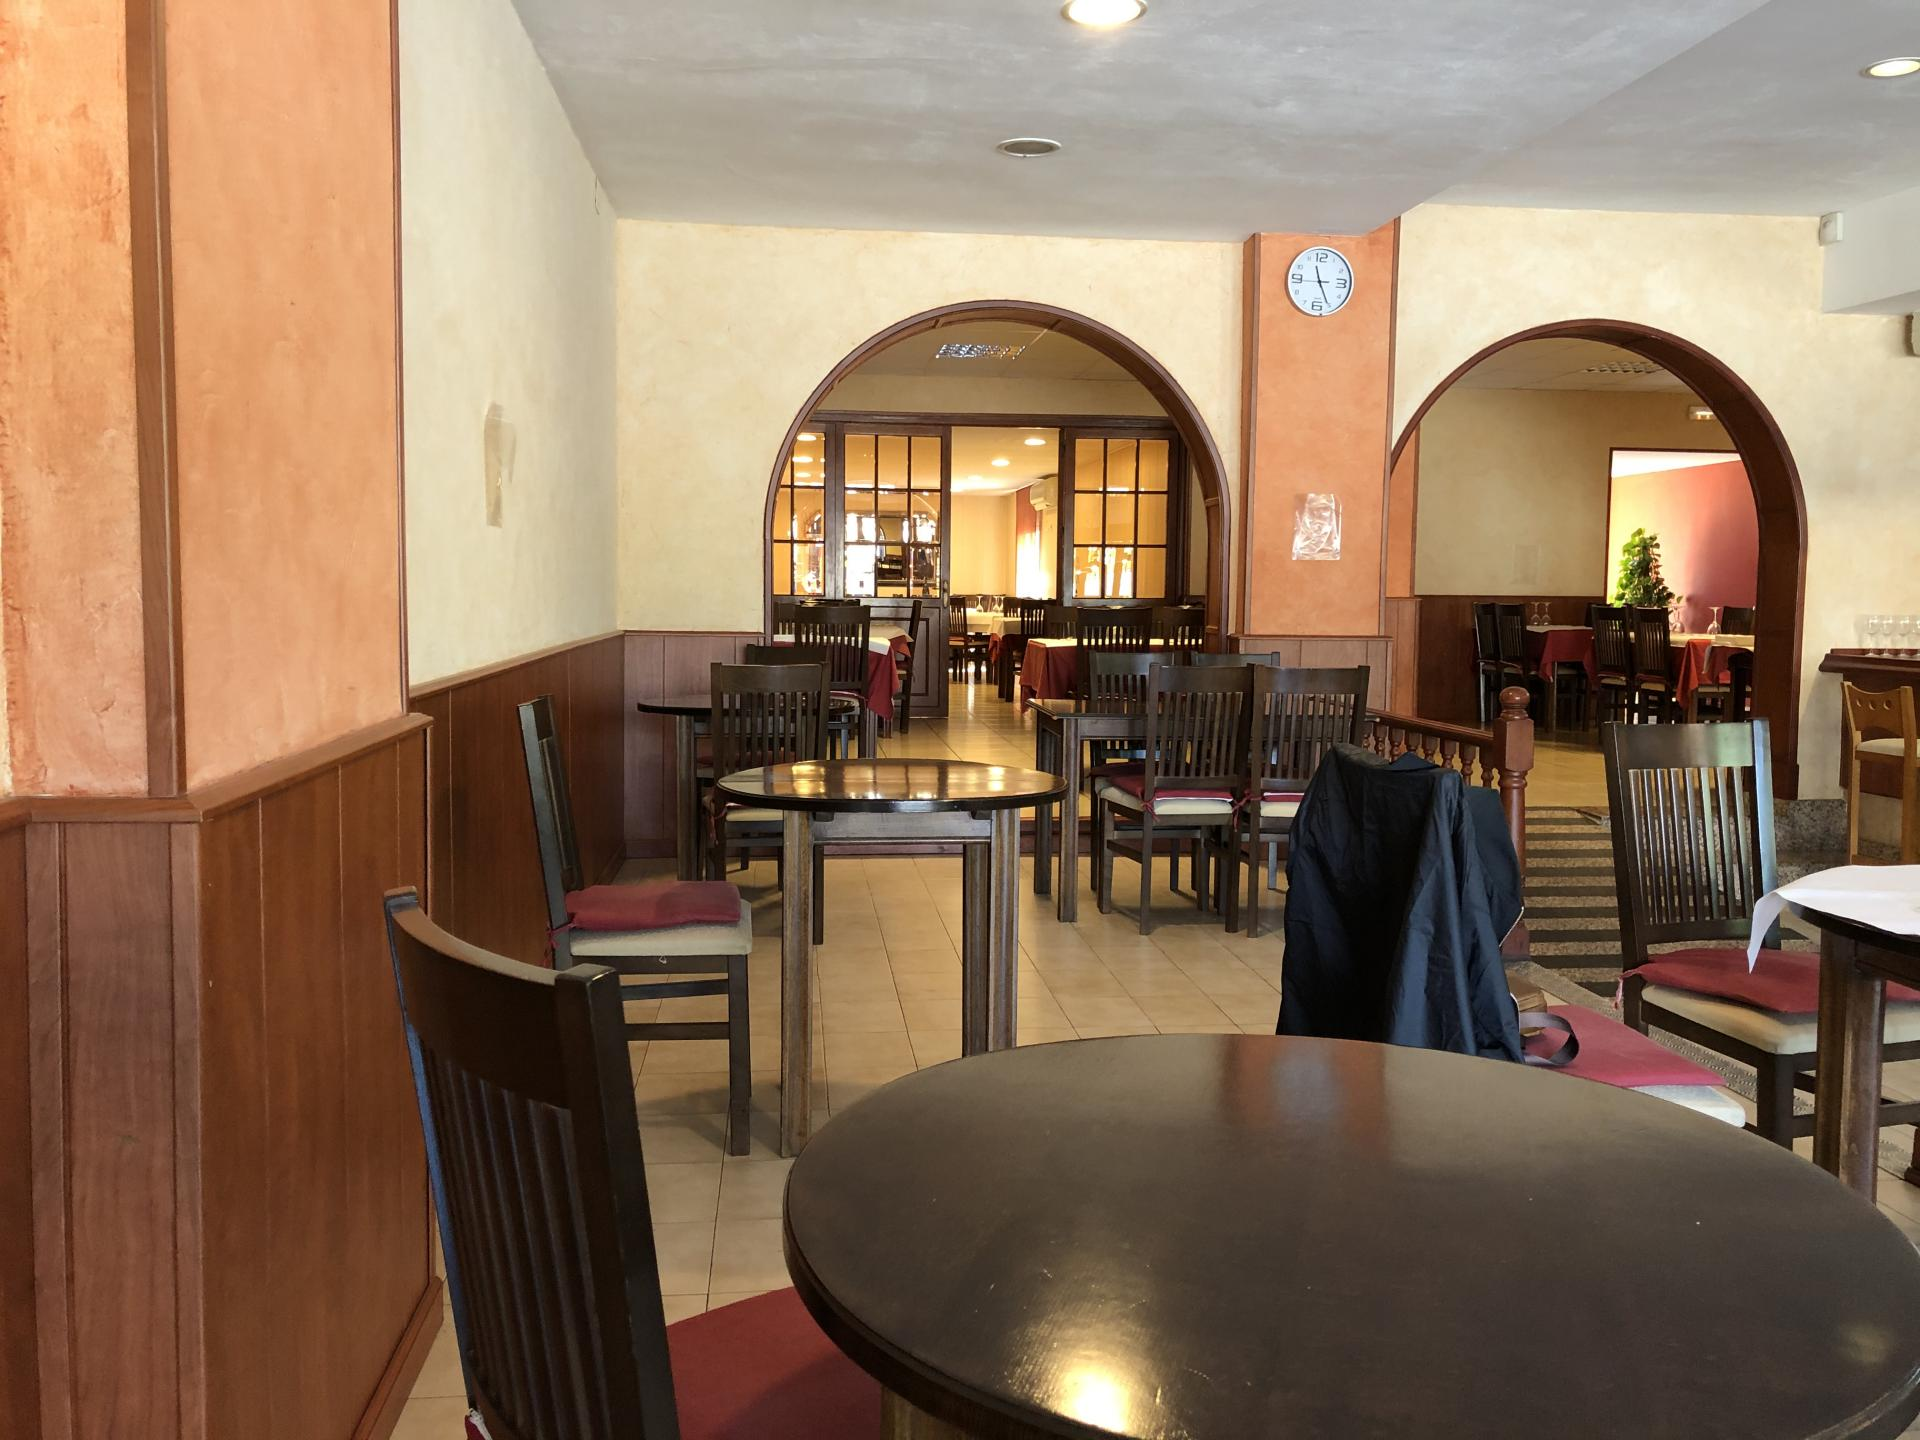 Foto 18 (V-735-2021) - Inmueble en  Venda a Santa Margarida i els Monjos